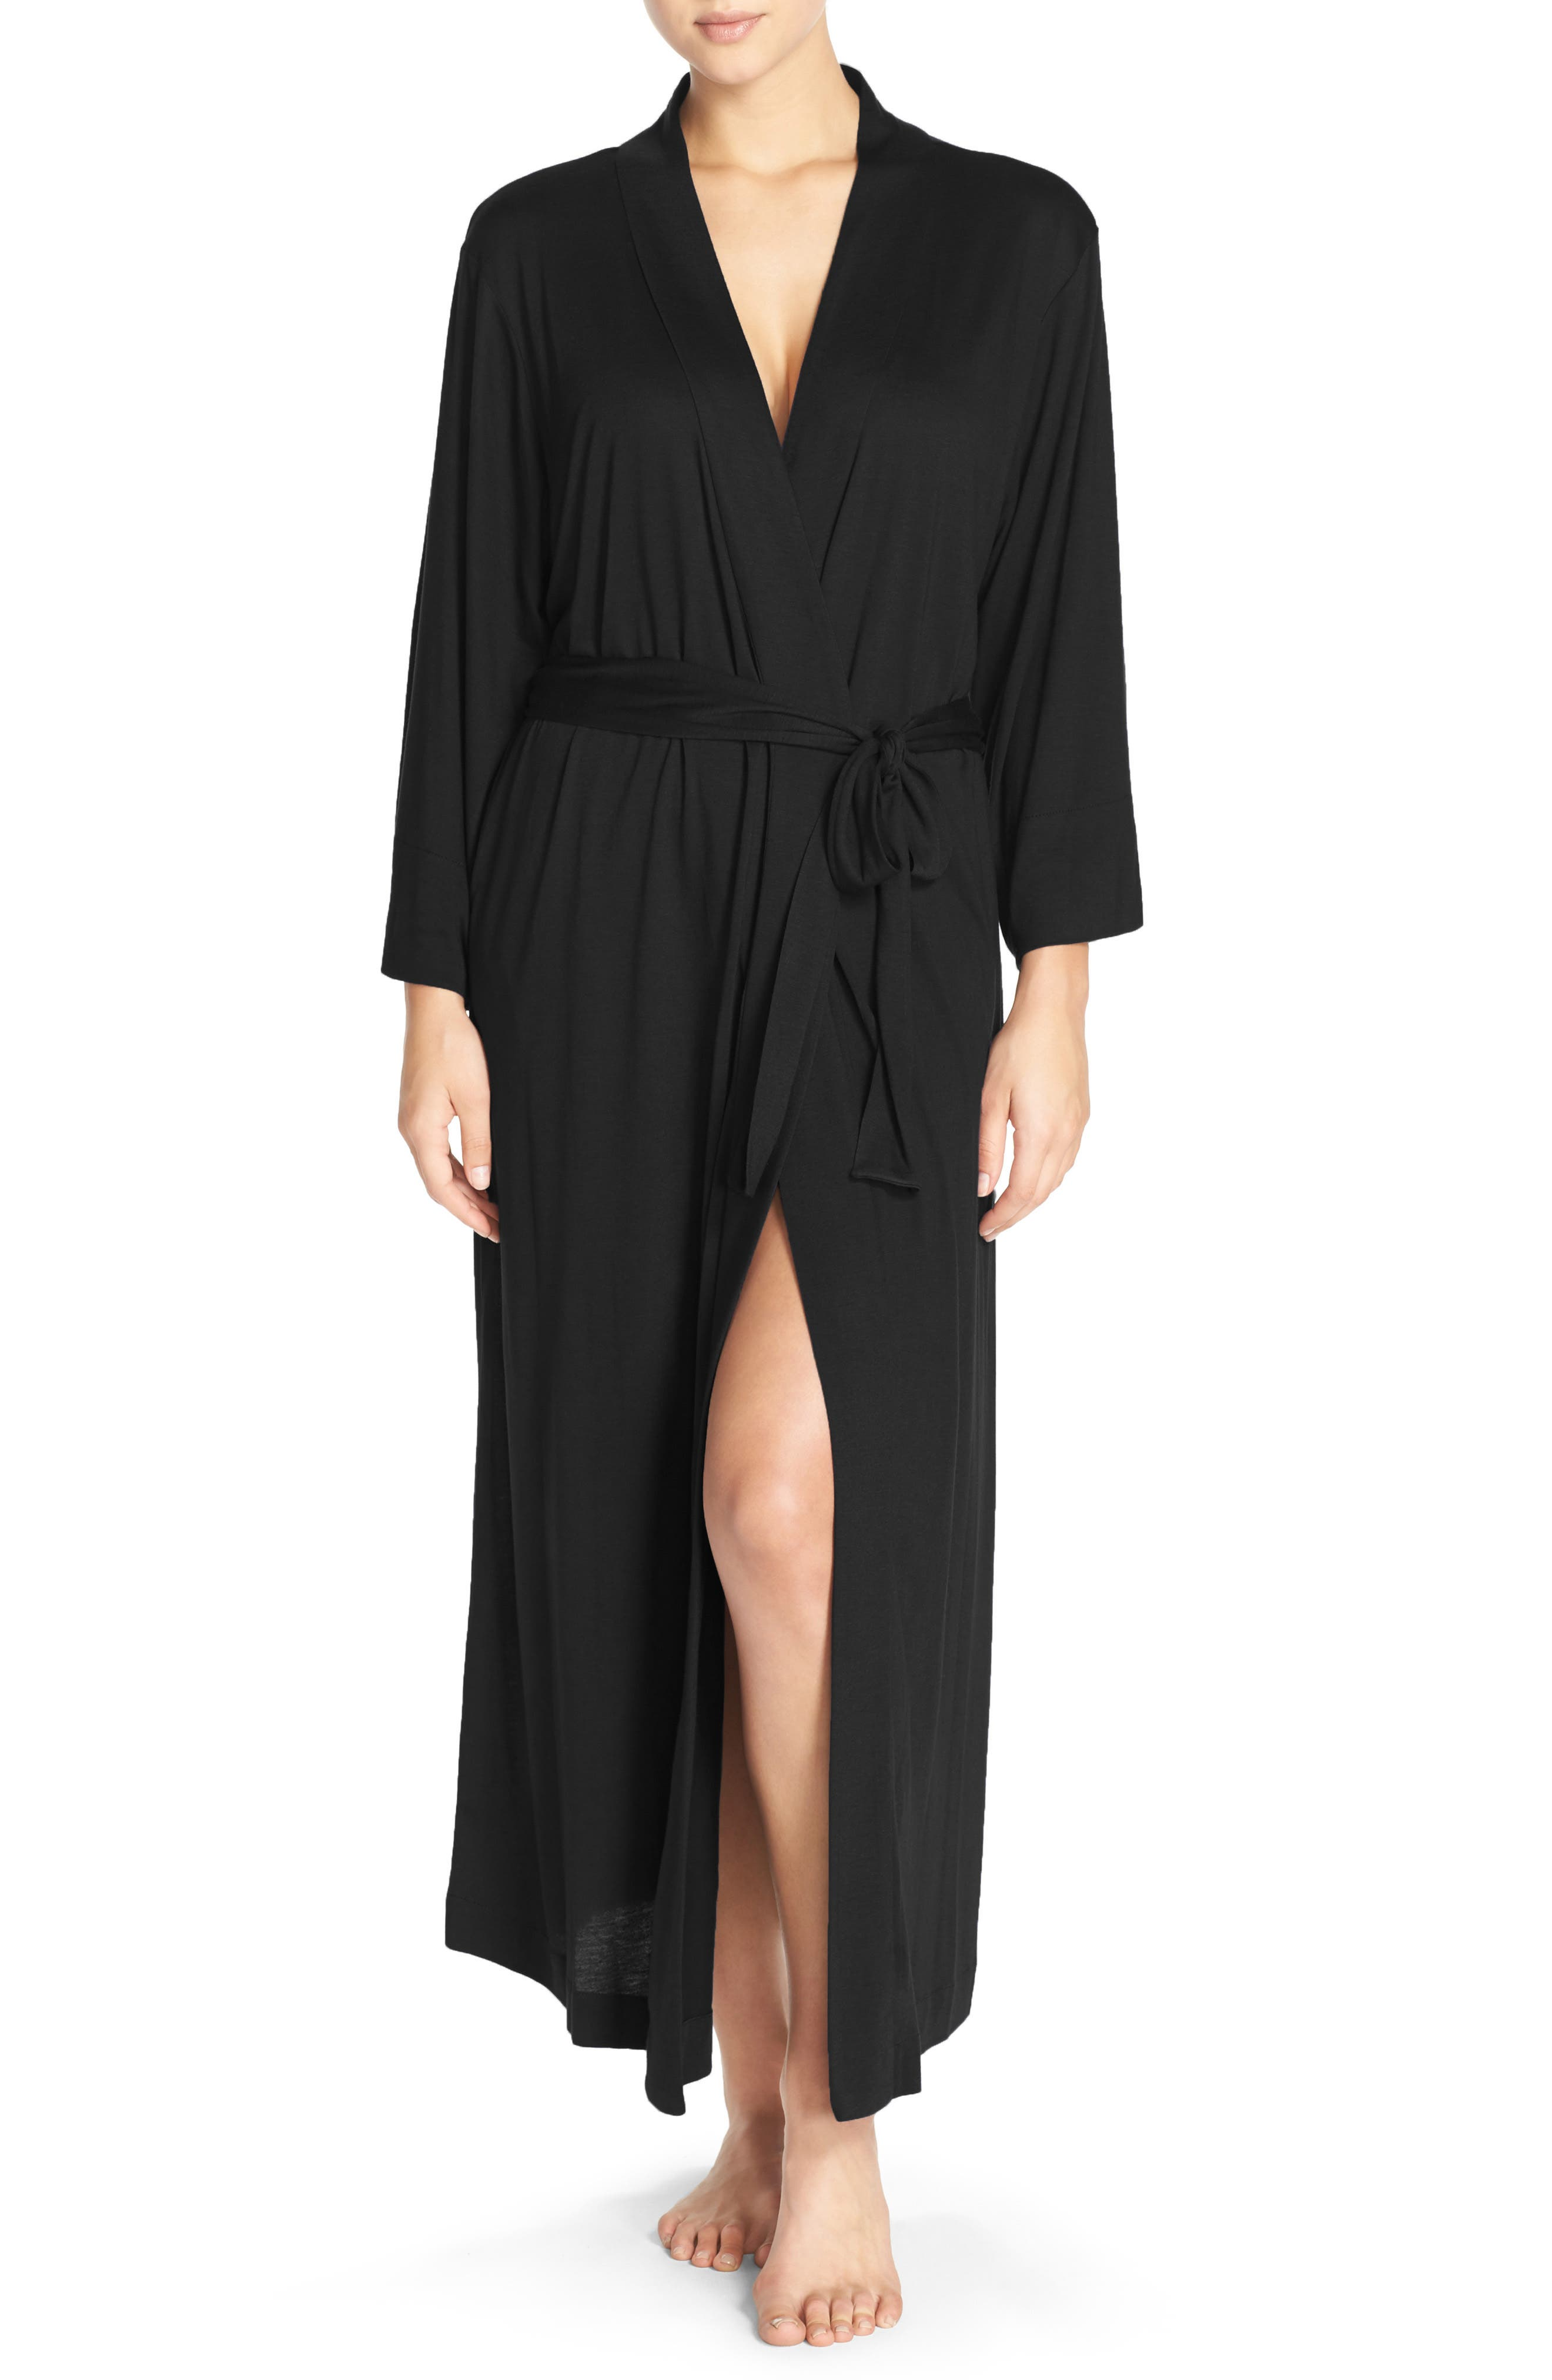 fbcd991a2c4 Women s Robes Sale